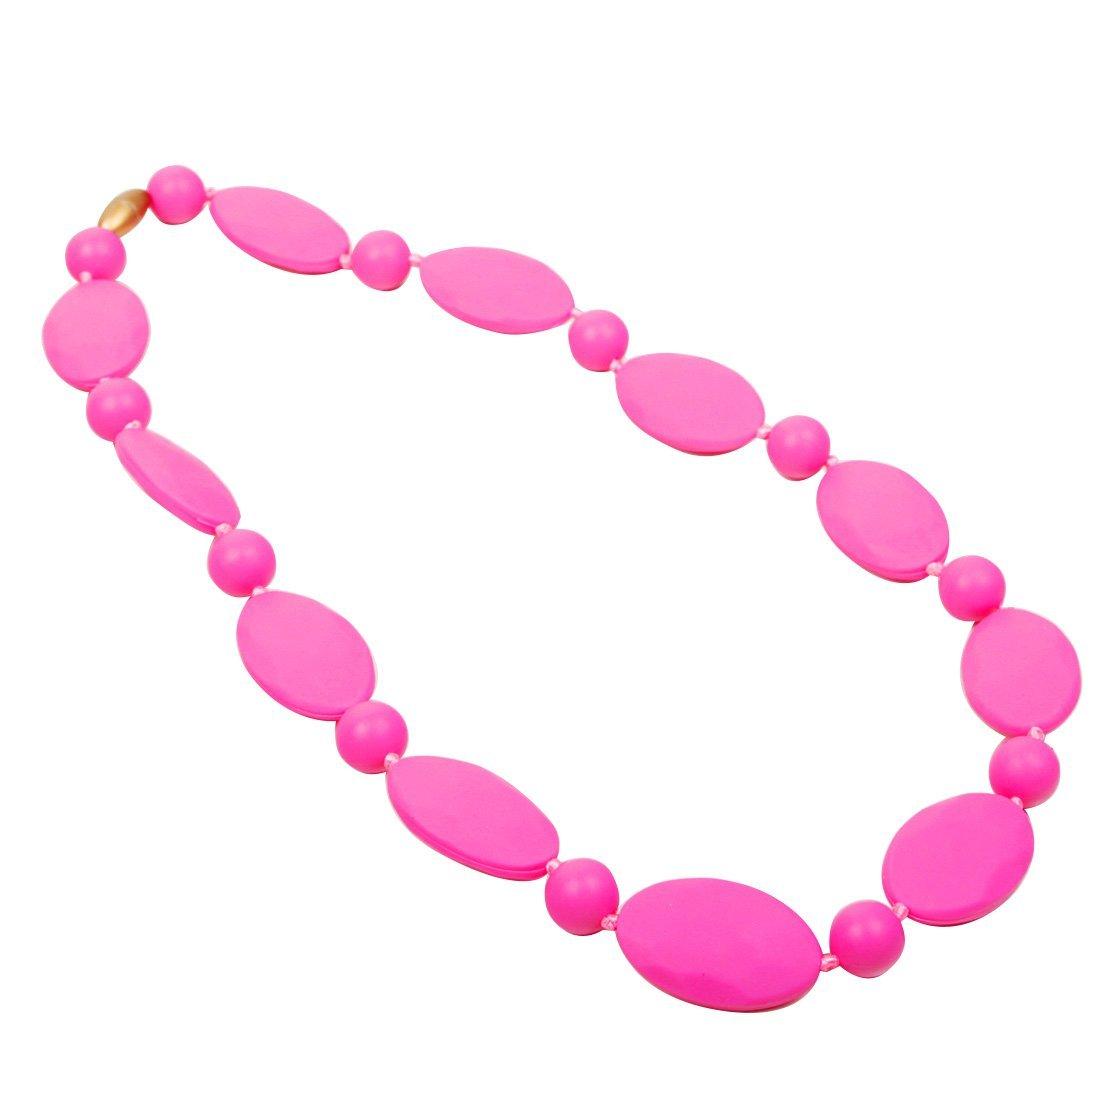 JET-BOND FS11-2 Silicone Chew Teething Necklace for Mom to Wear Nursing  Baby Toddles Bite Jewelry Fushia Gem Stone Toxic-Free(2707 pink stone)